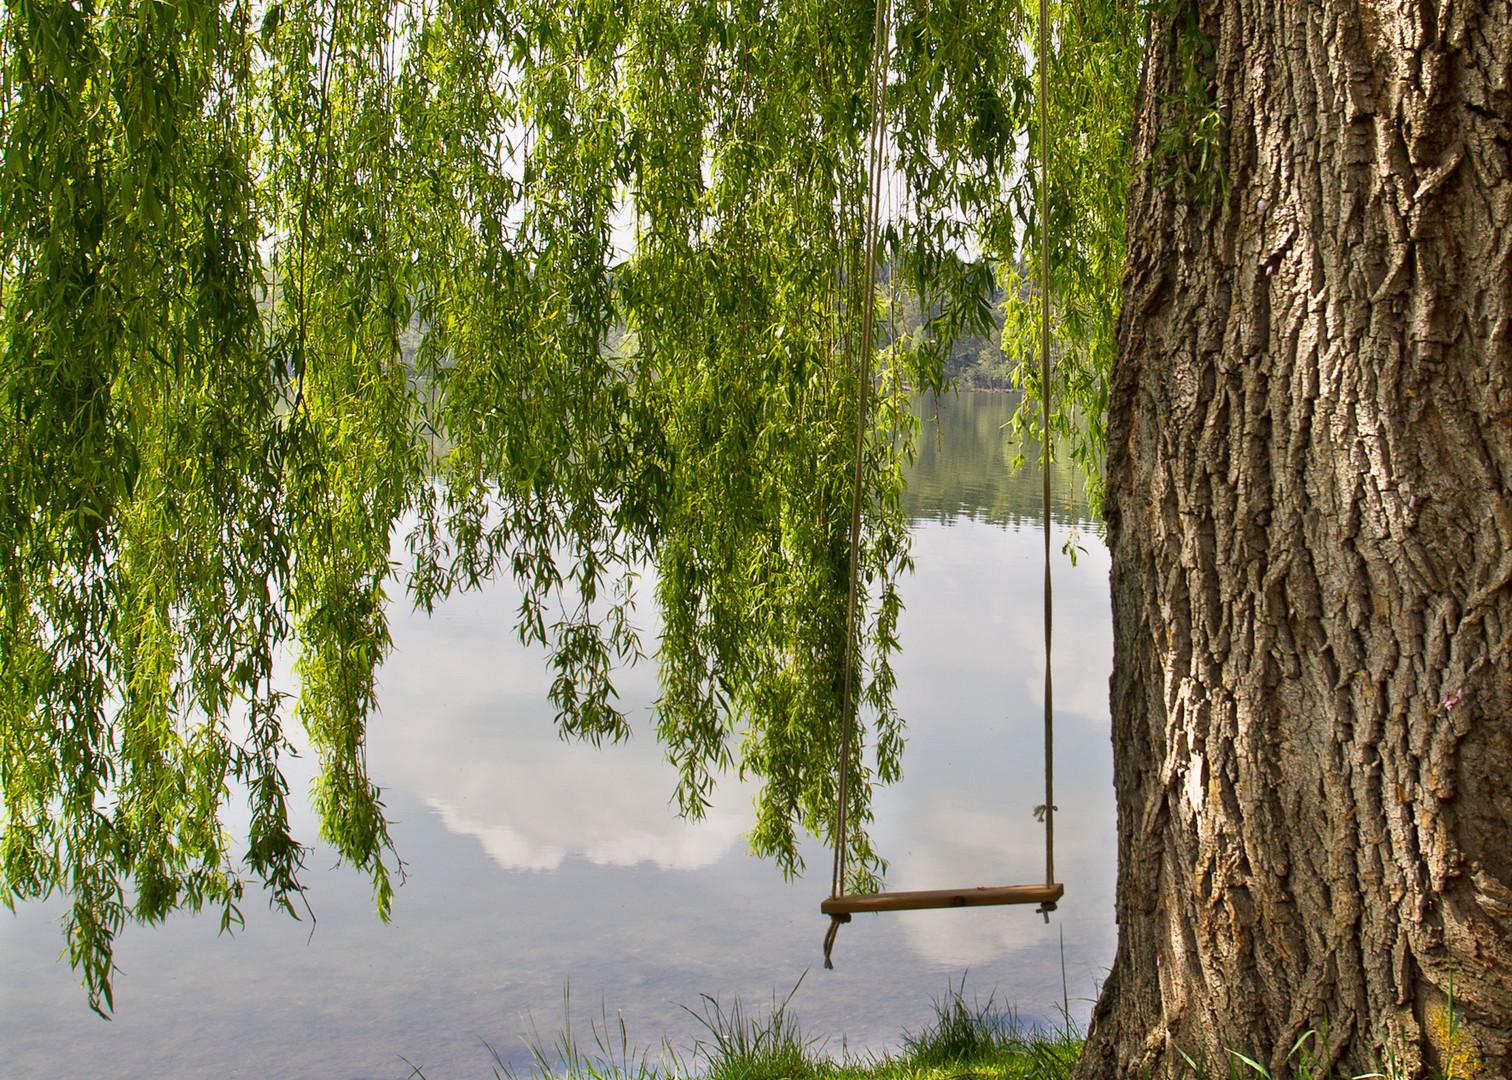 Schaukel am See